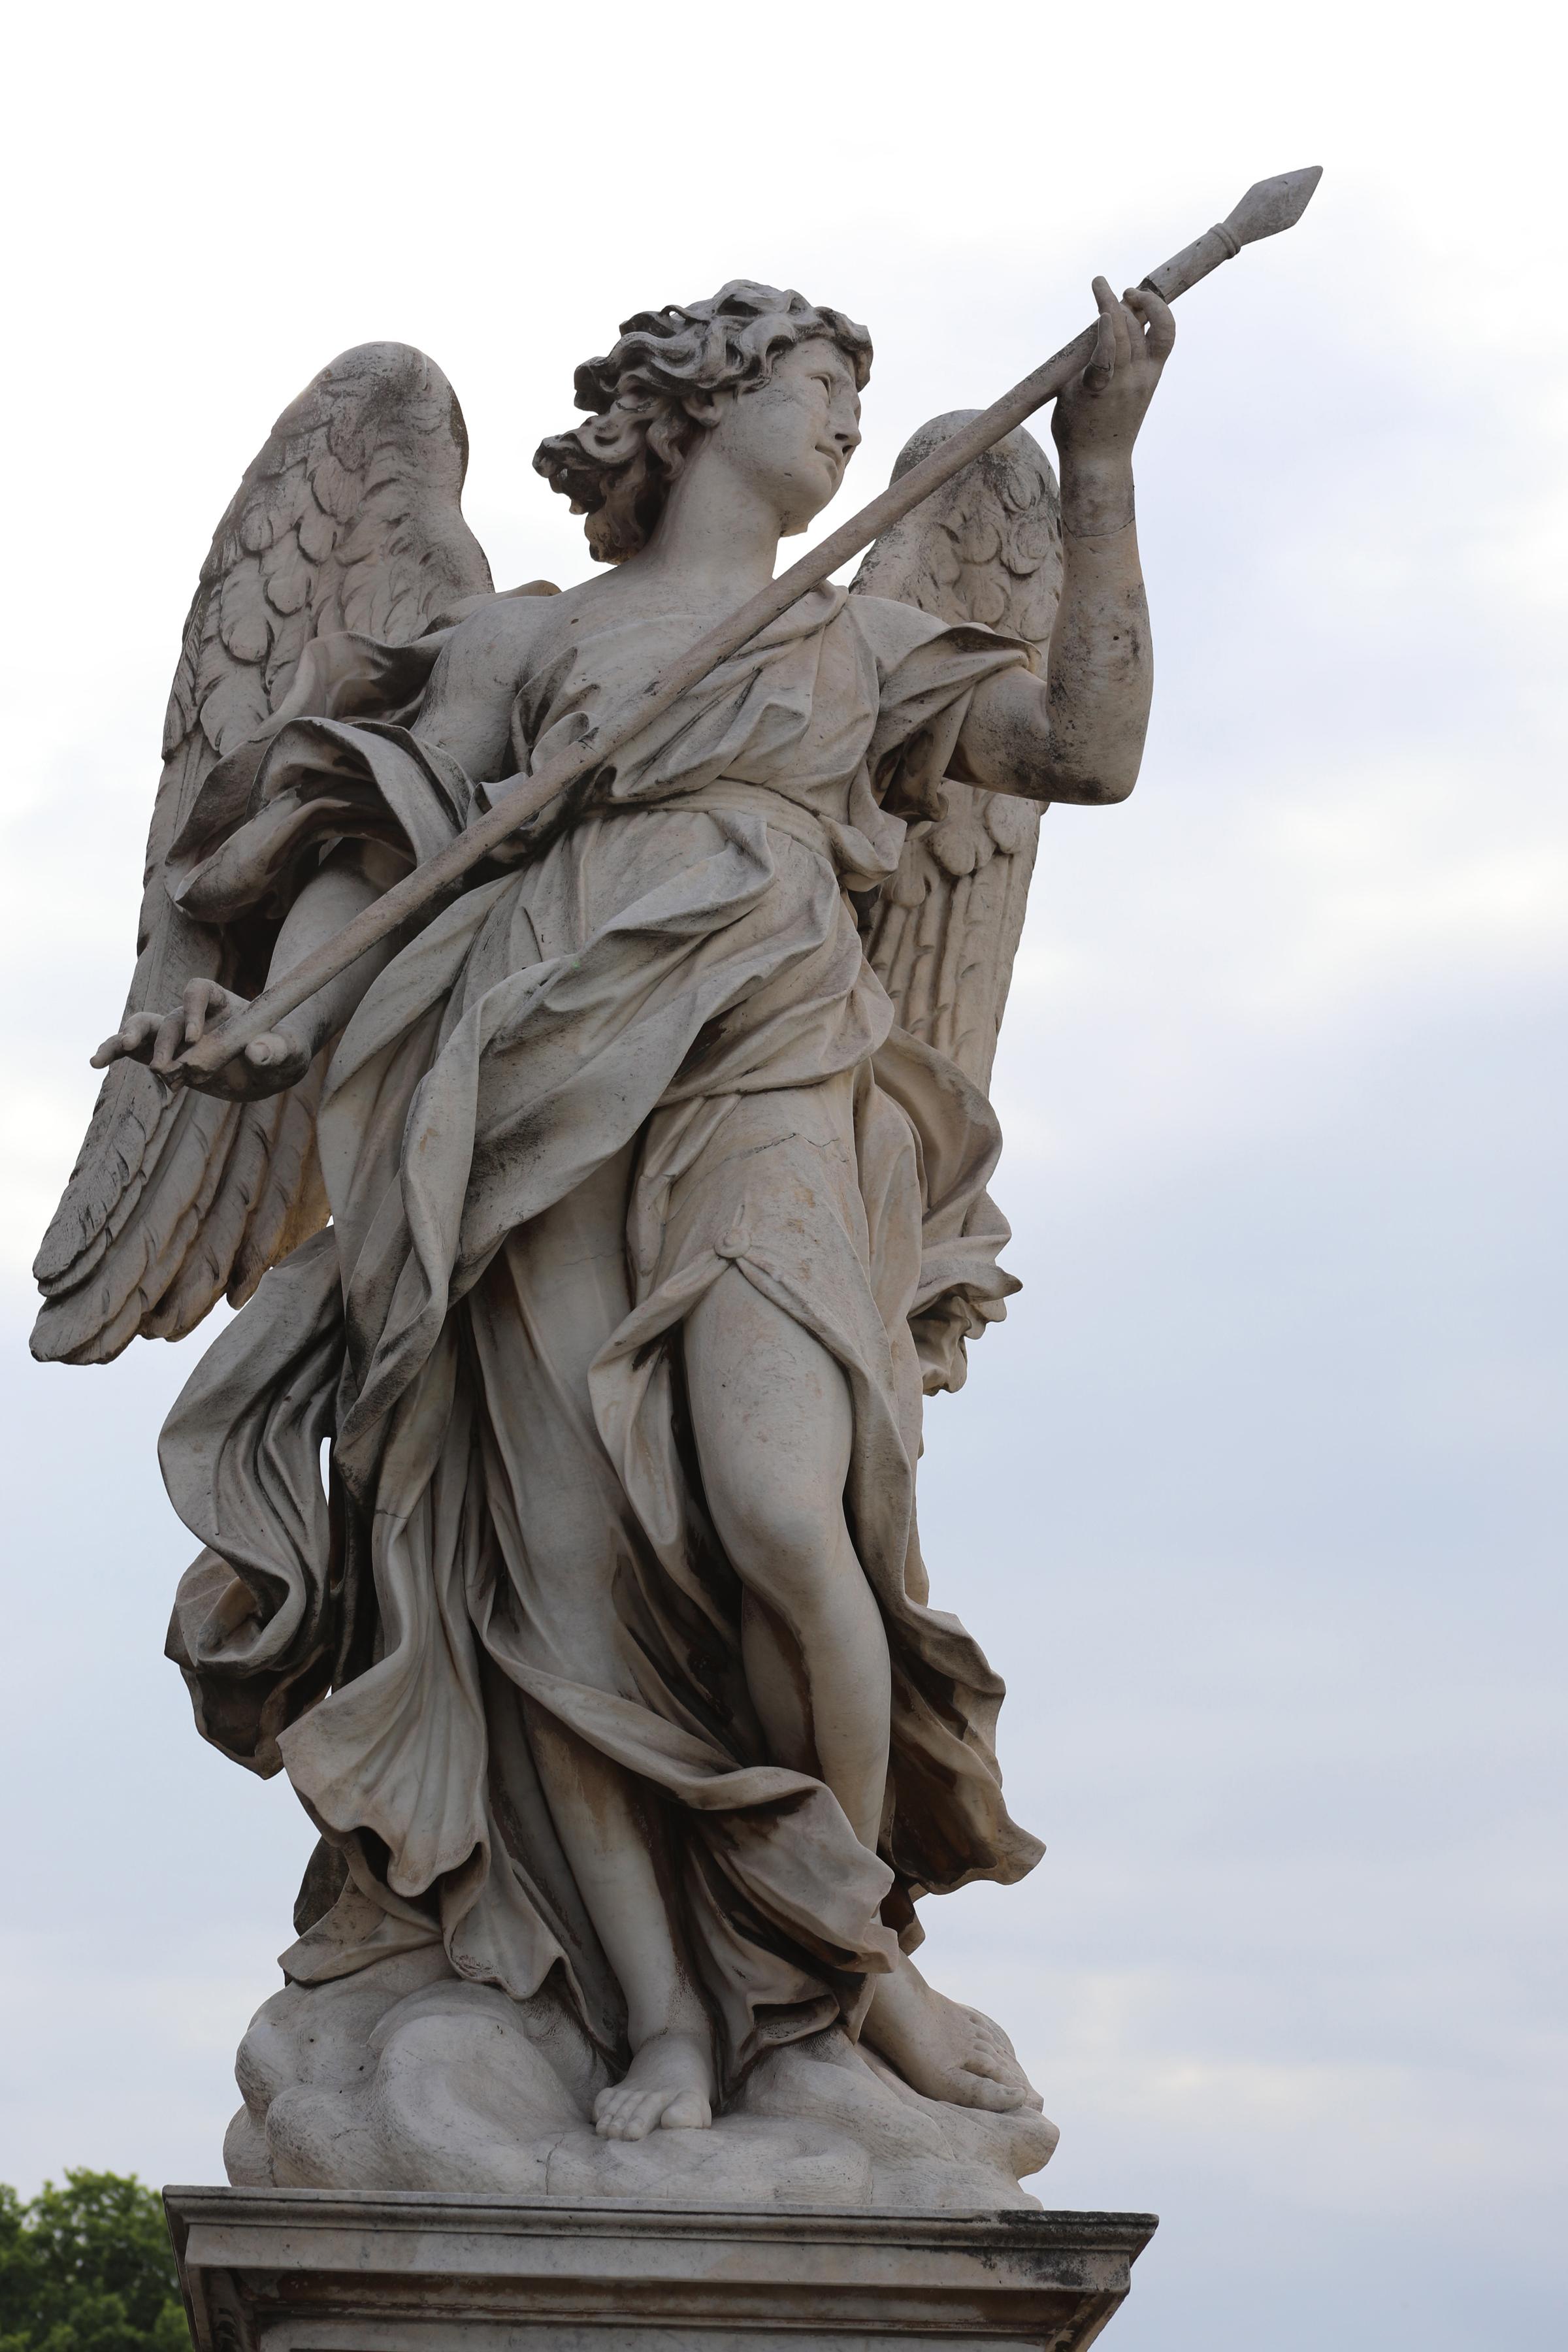 Angel statue outside The Vatican, Rome, Italy     https://www.ebay.com/itm/263679779903?ssPageName=STRK:MESELX:IT&_trksid=p3984.m1555.l2649